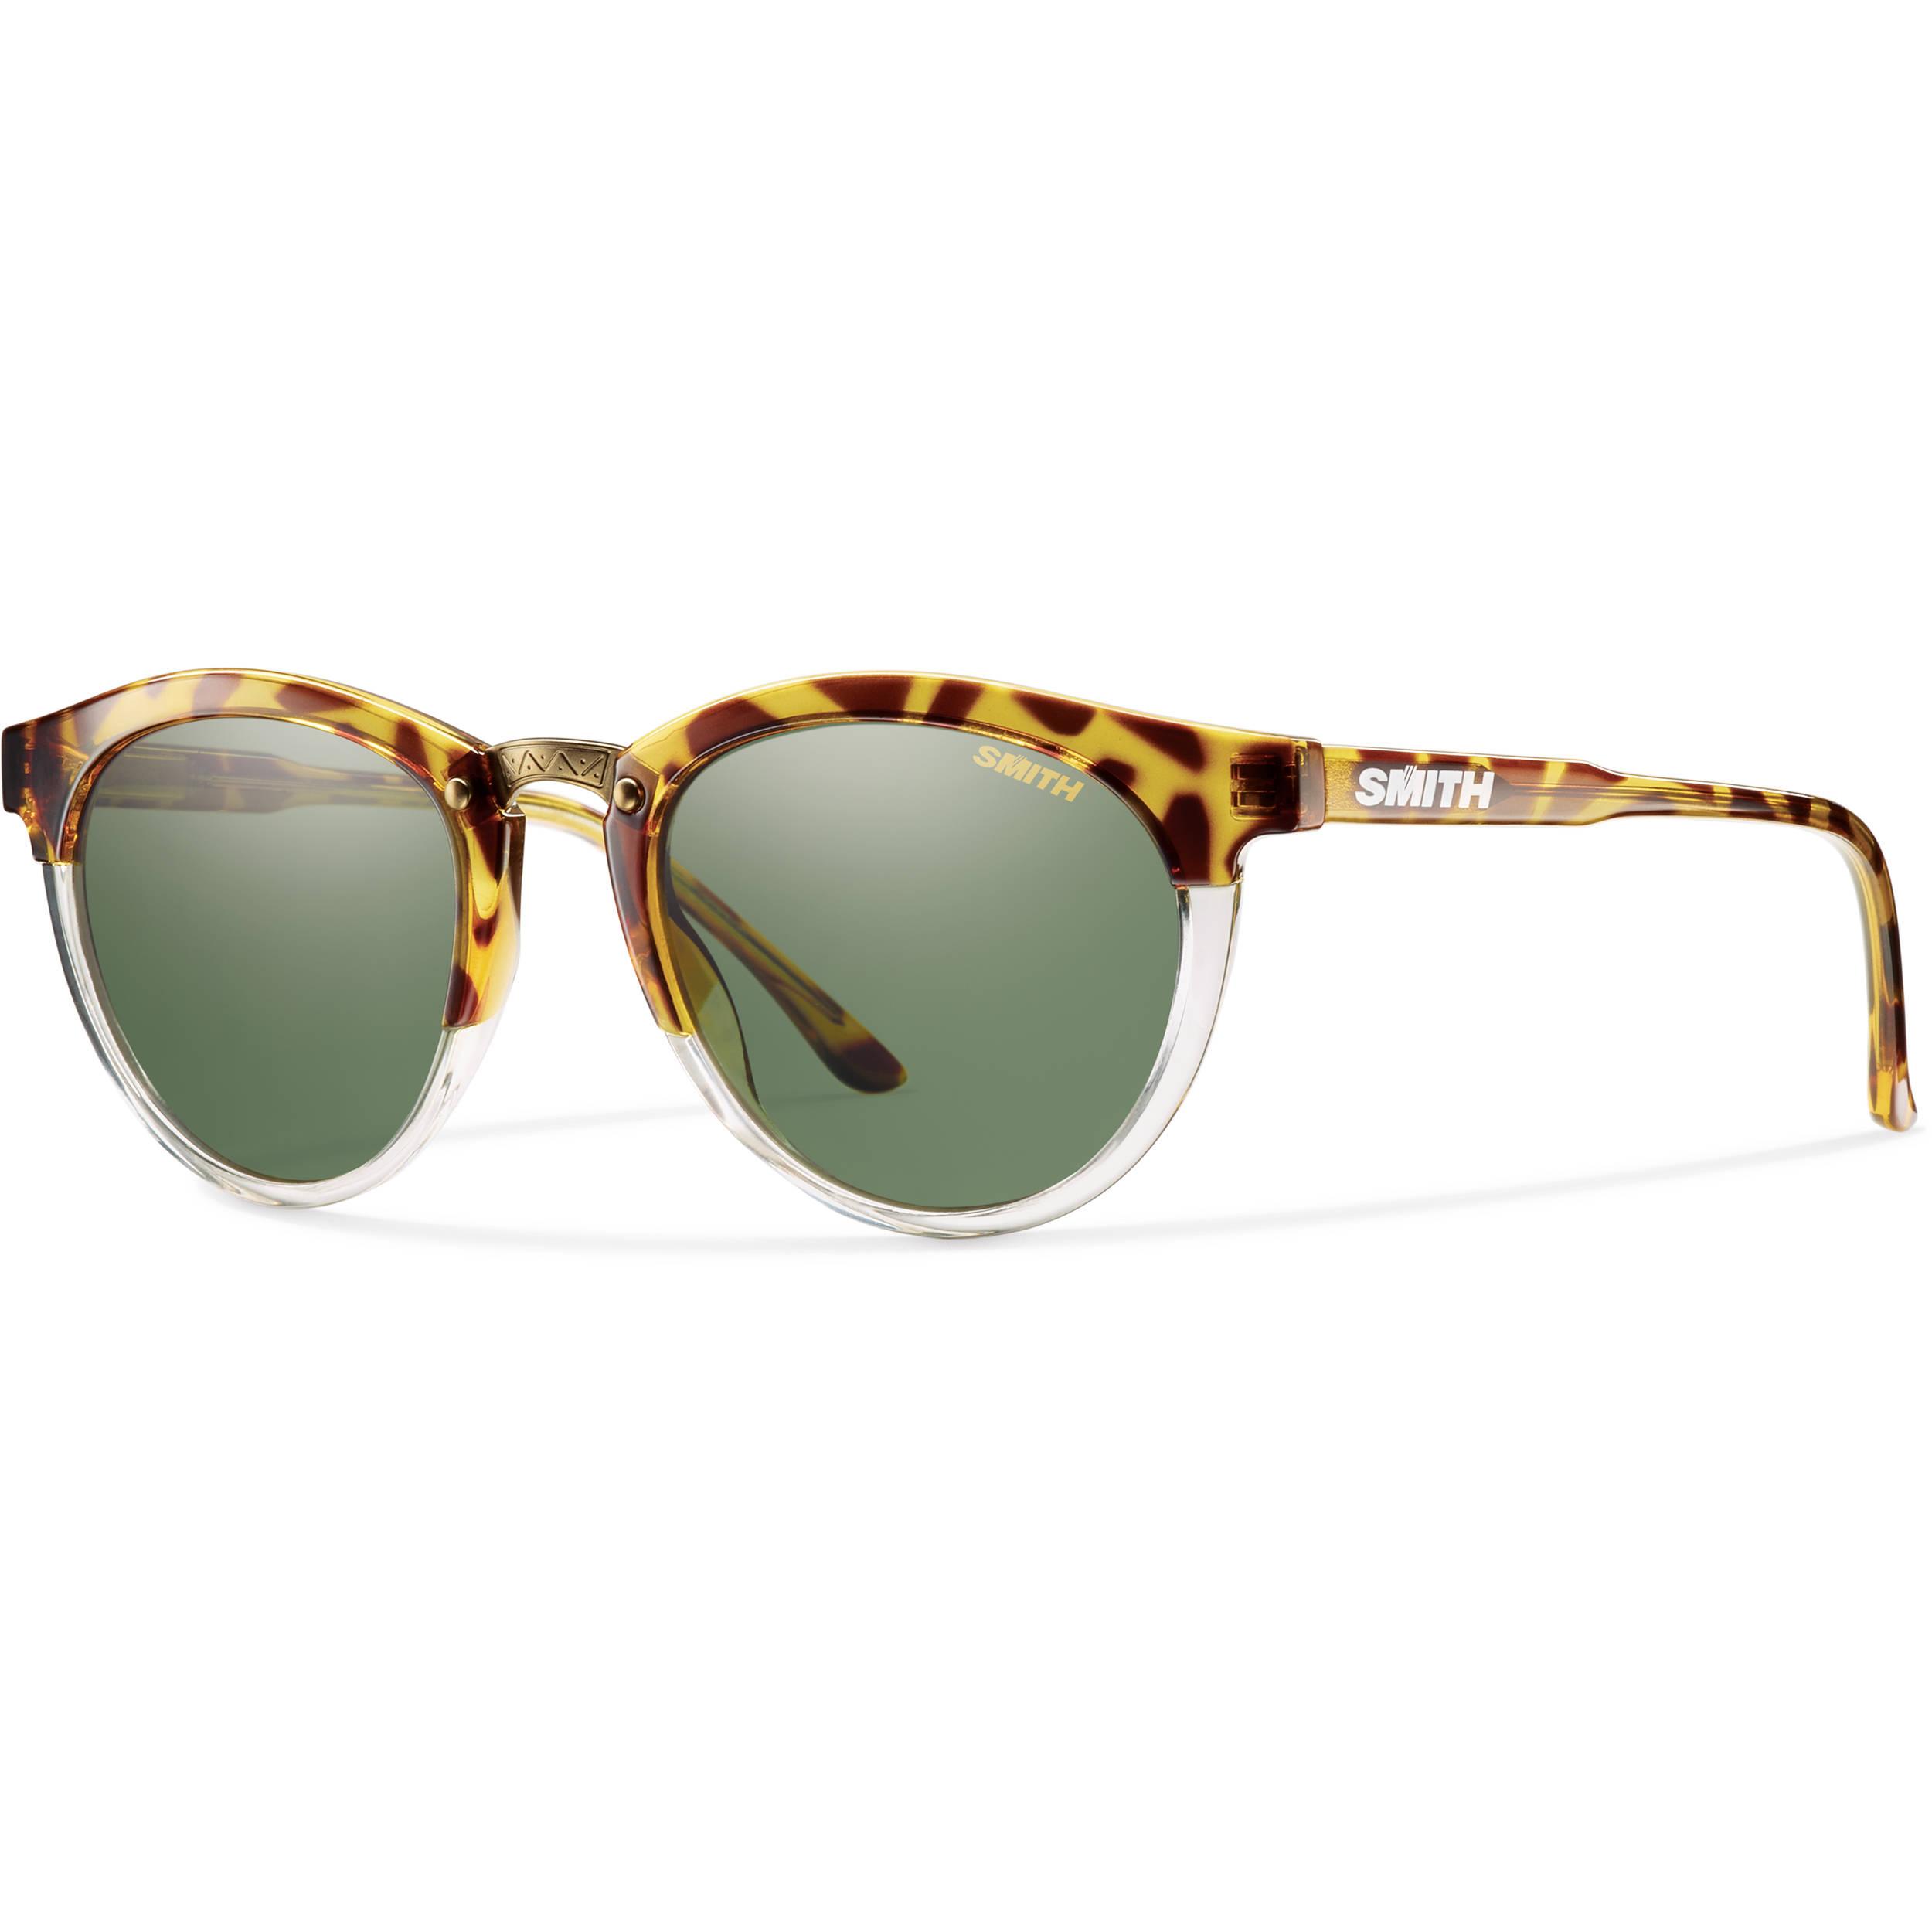 107f4639a97a Smith Parallel Polarized Women  39 s Sunglasses